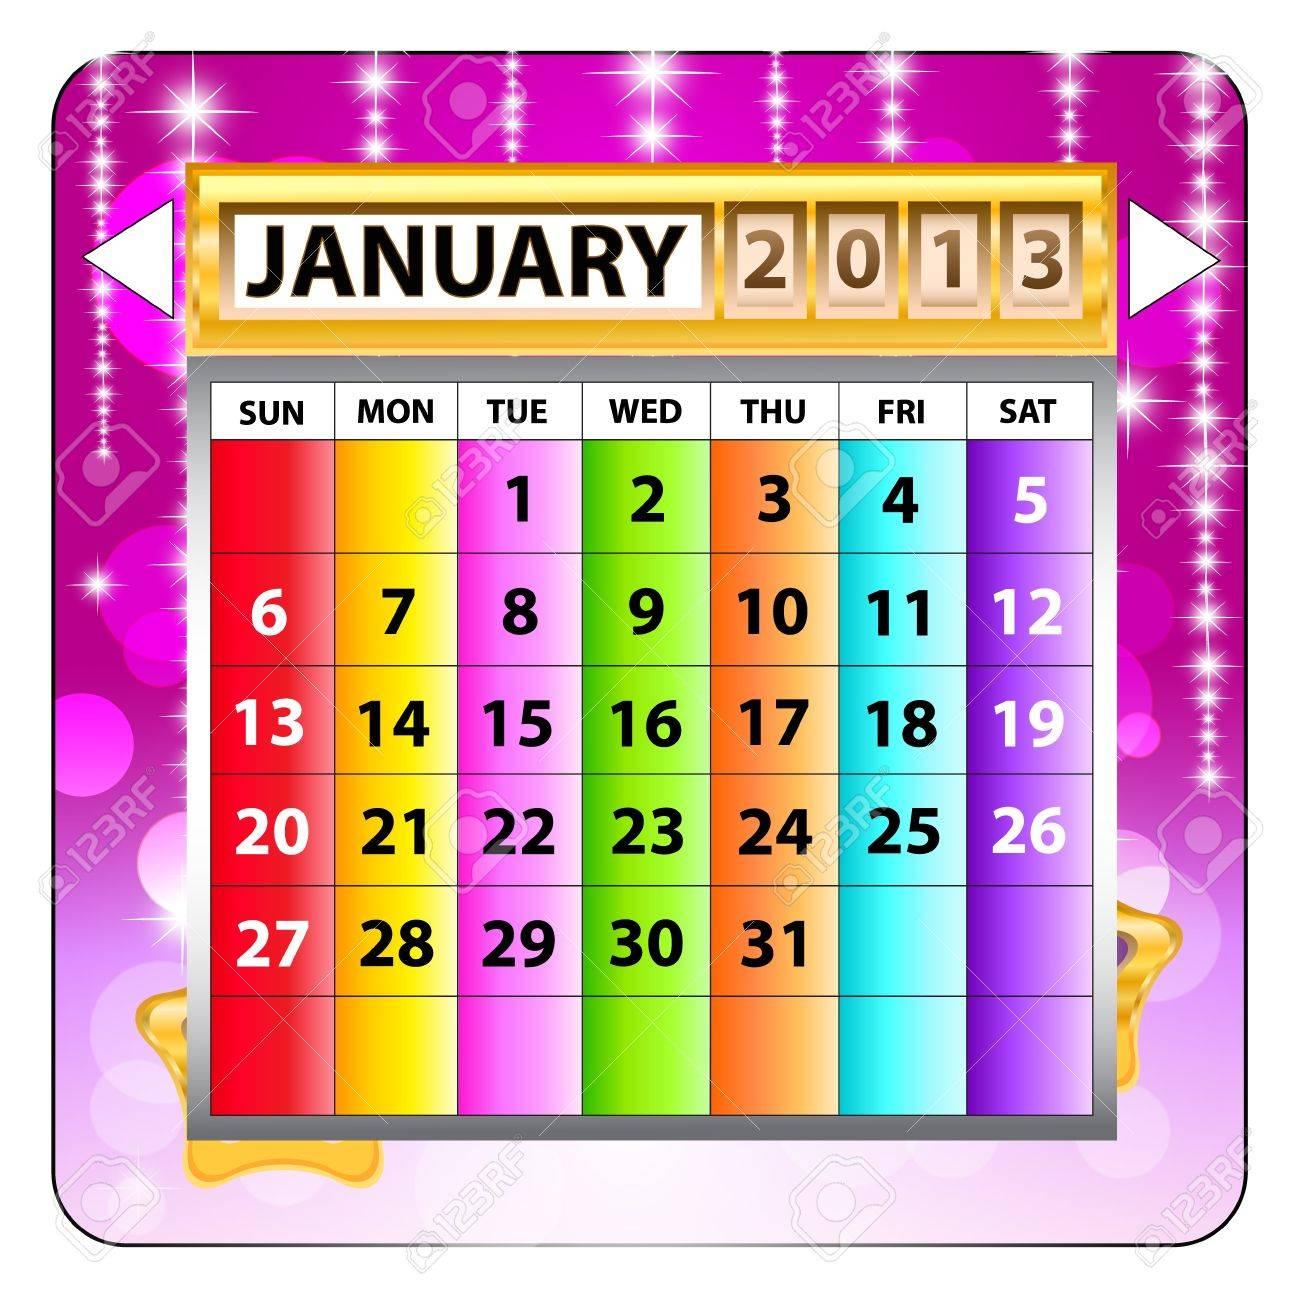 January 2013 calendar  Happy new year Stock Vector - 15143216